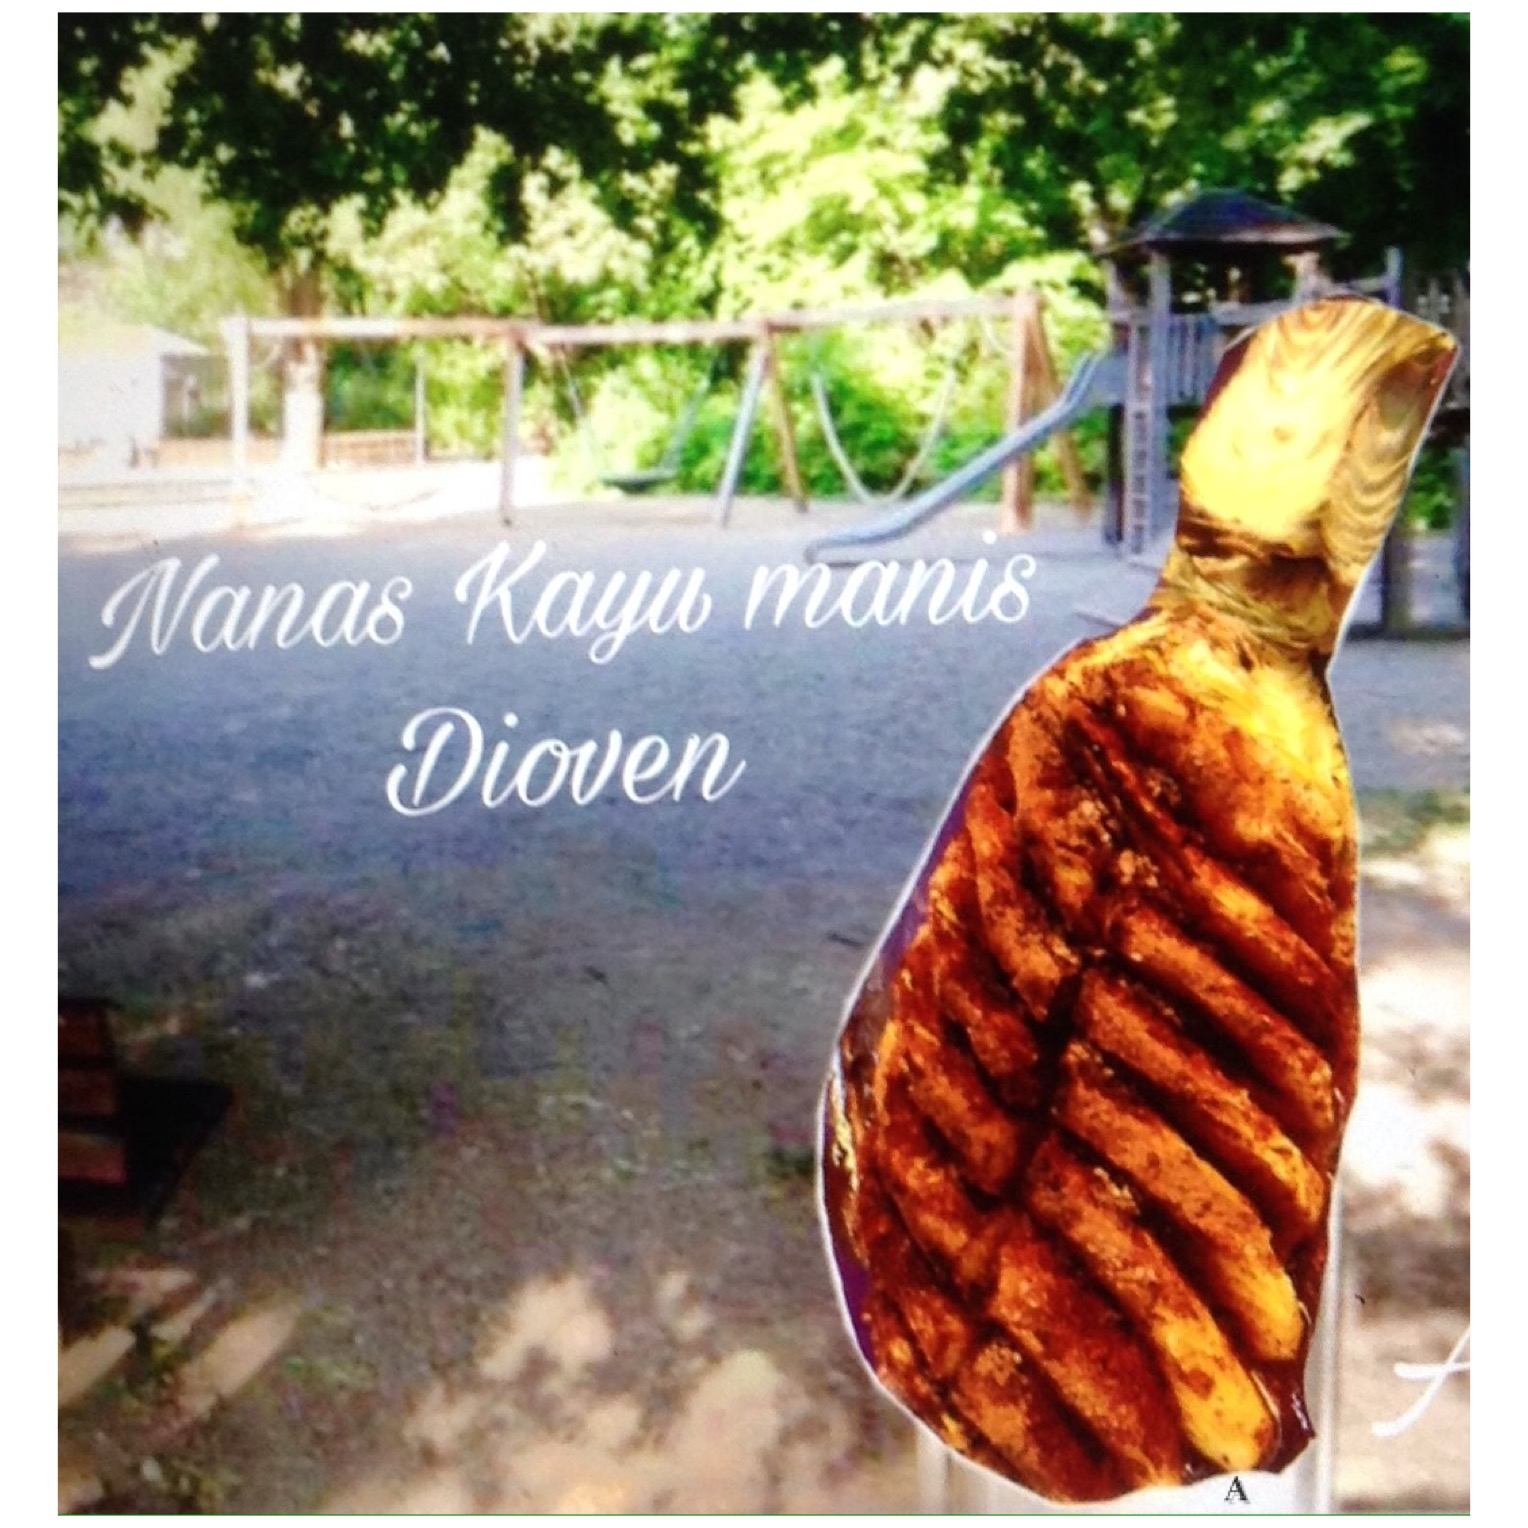 Resep Nanas Kayu manis Dioven